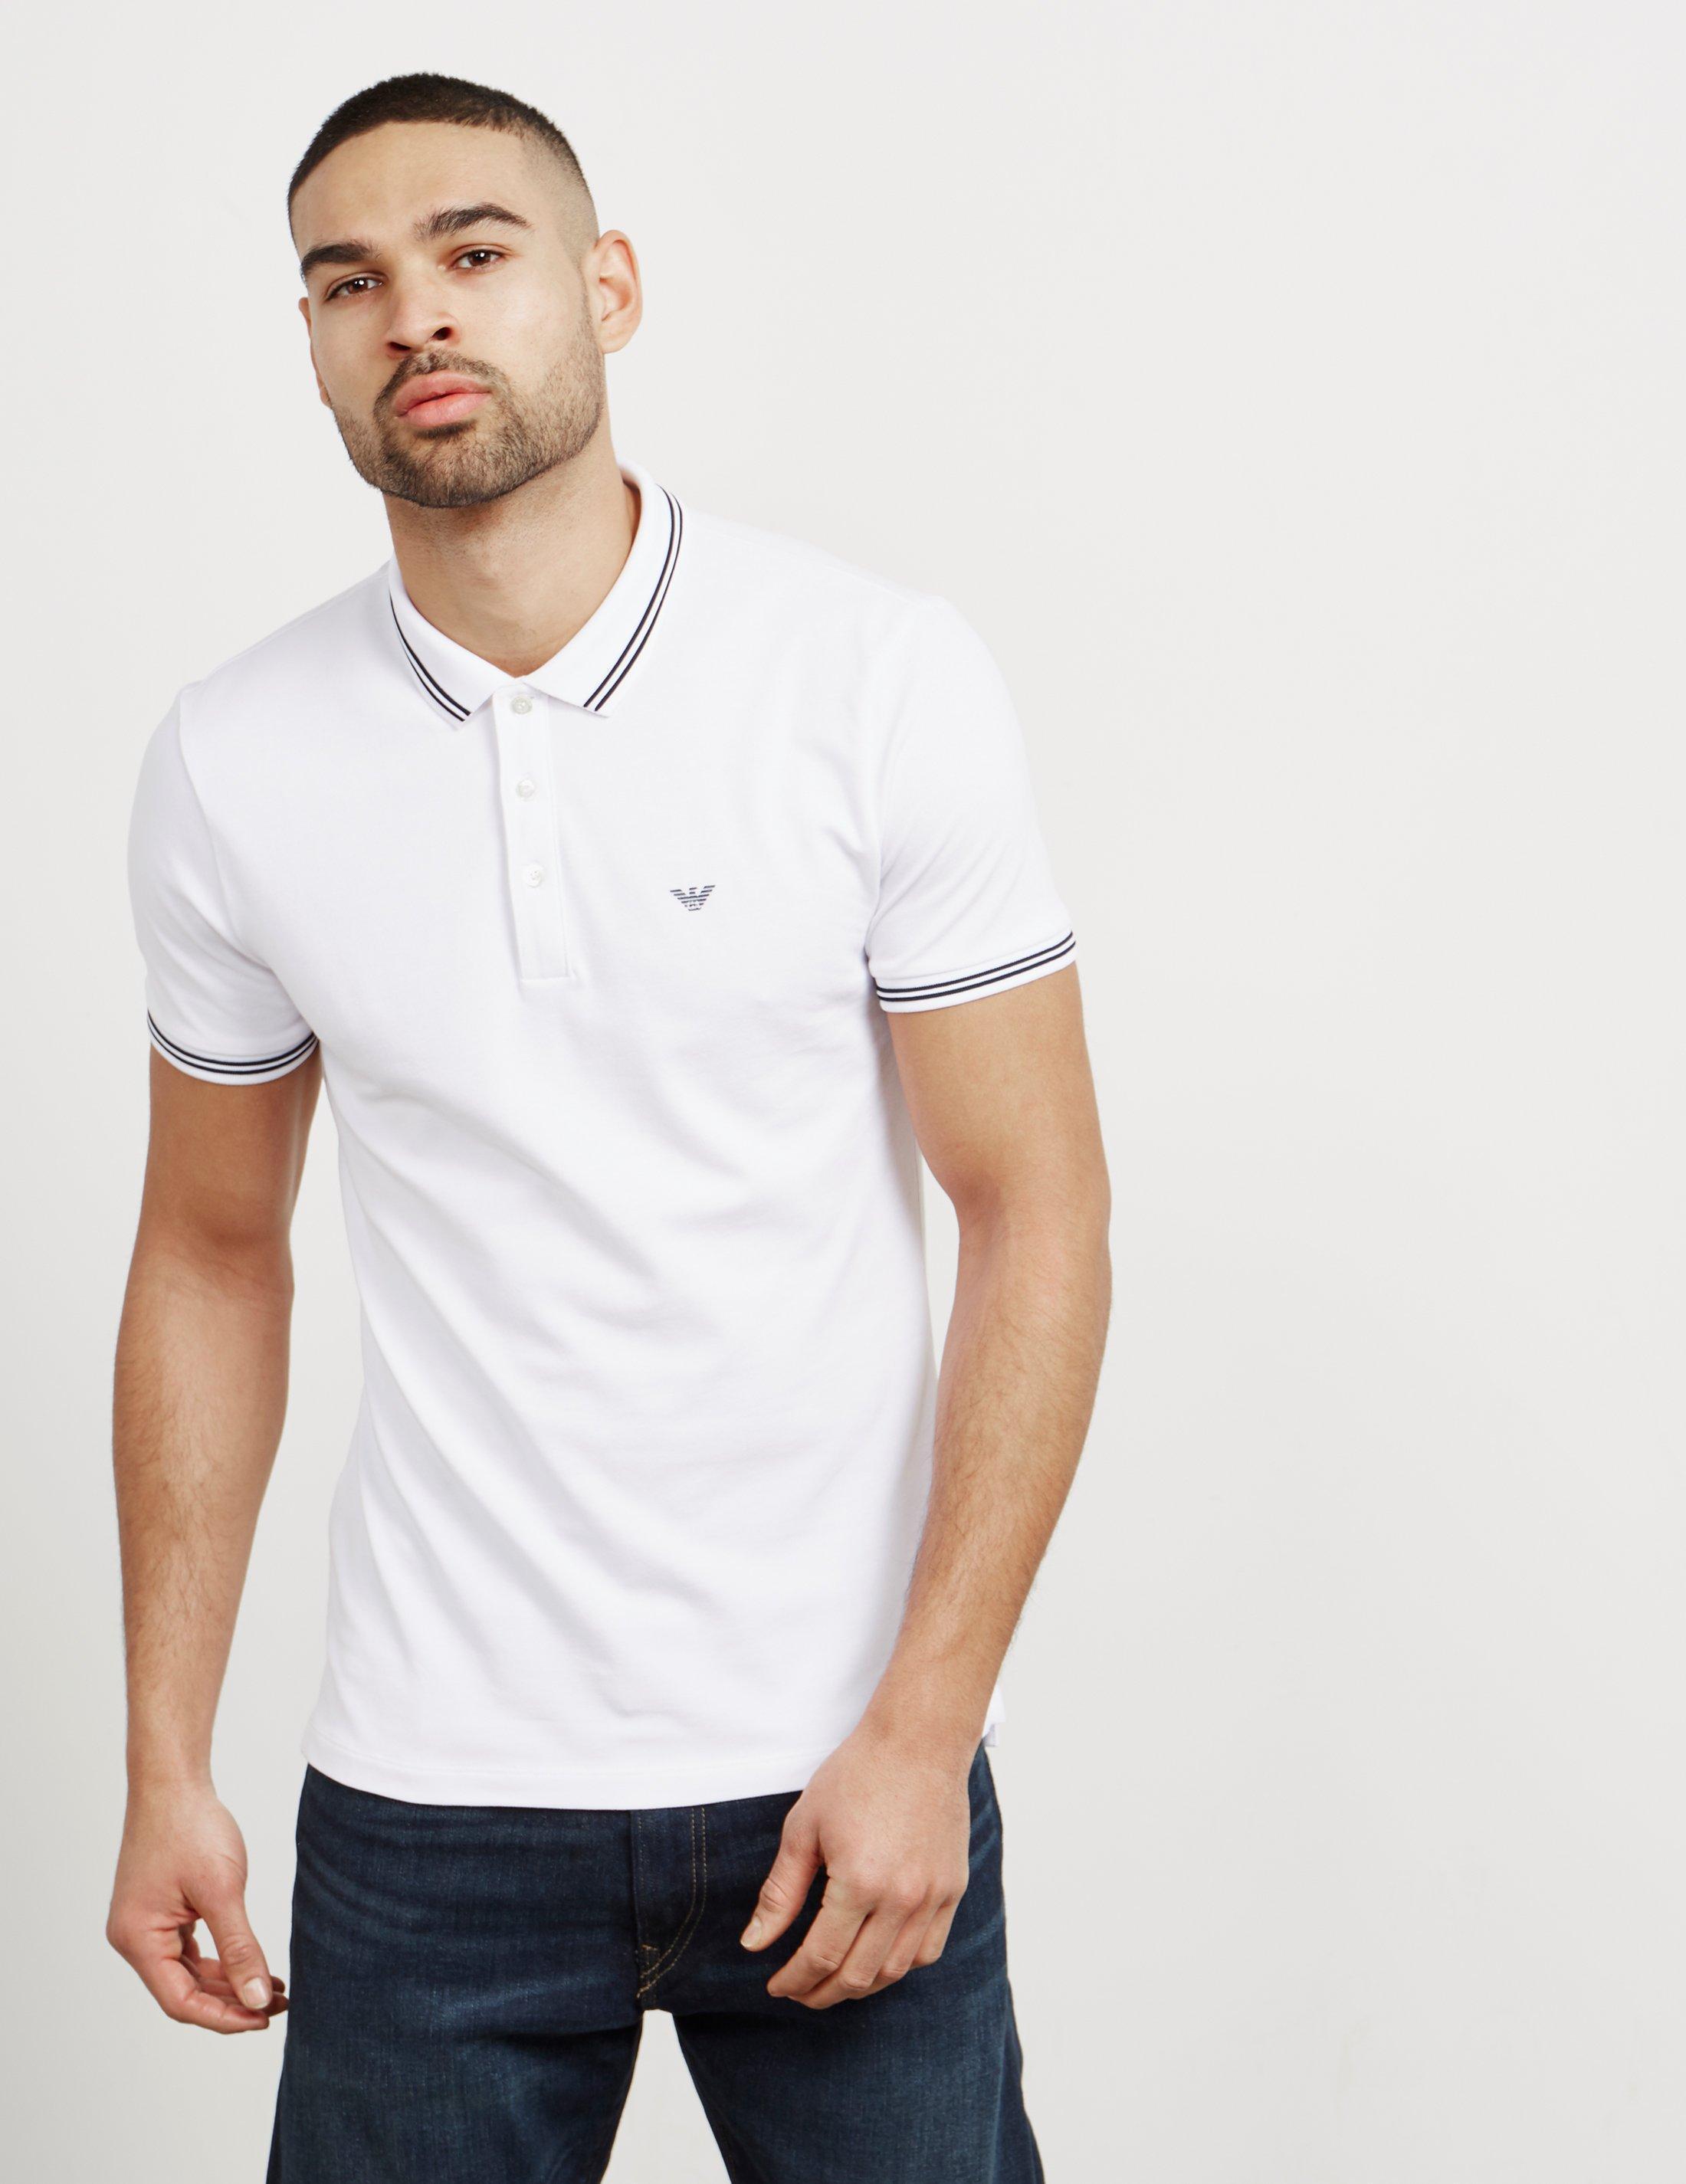 10683fa4 Emporio Armani Mens Basic Tipped Short Sleeve Polo Shirt White in ...